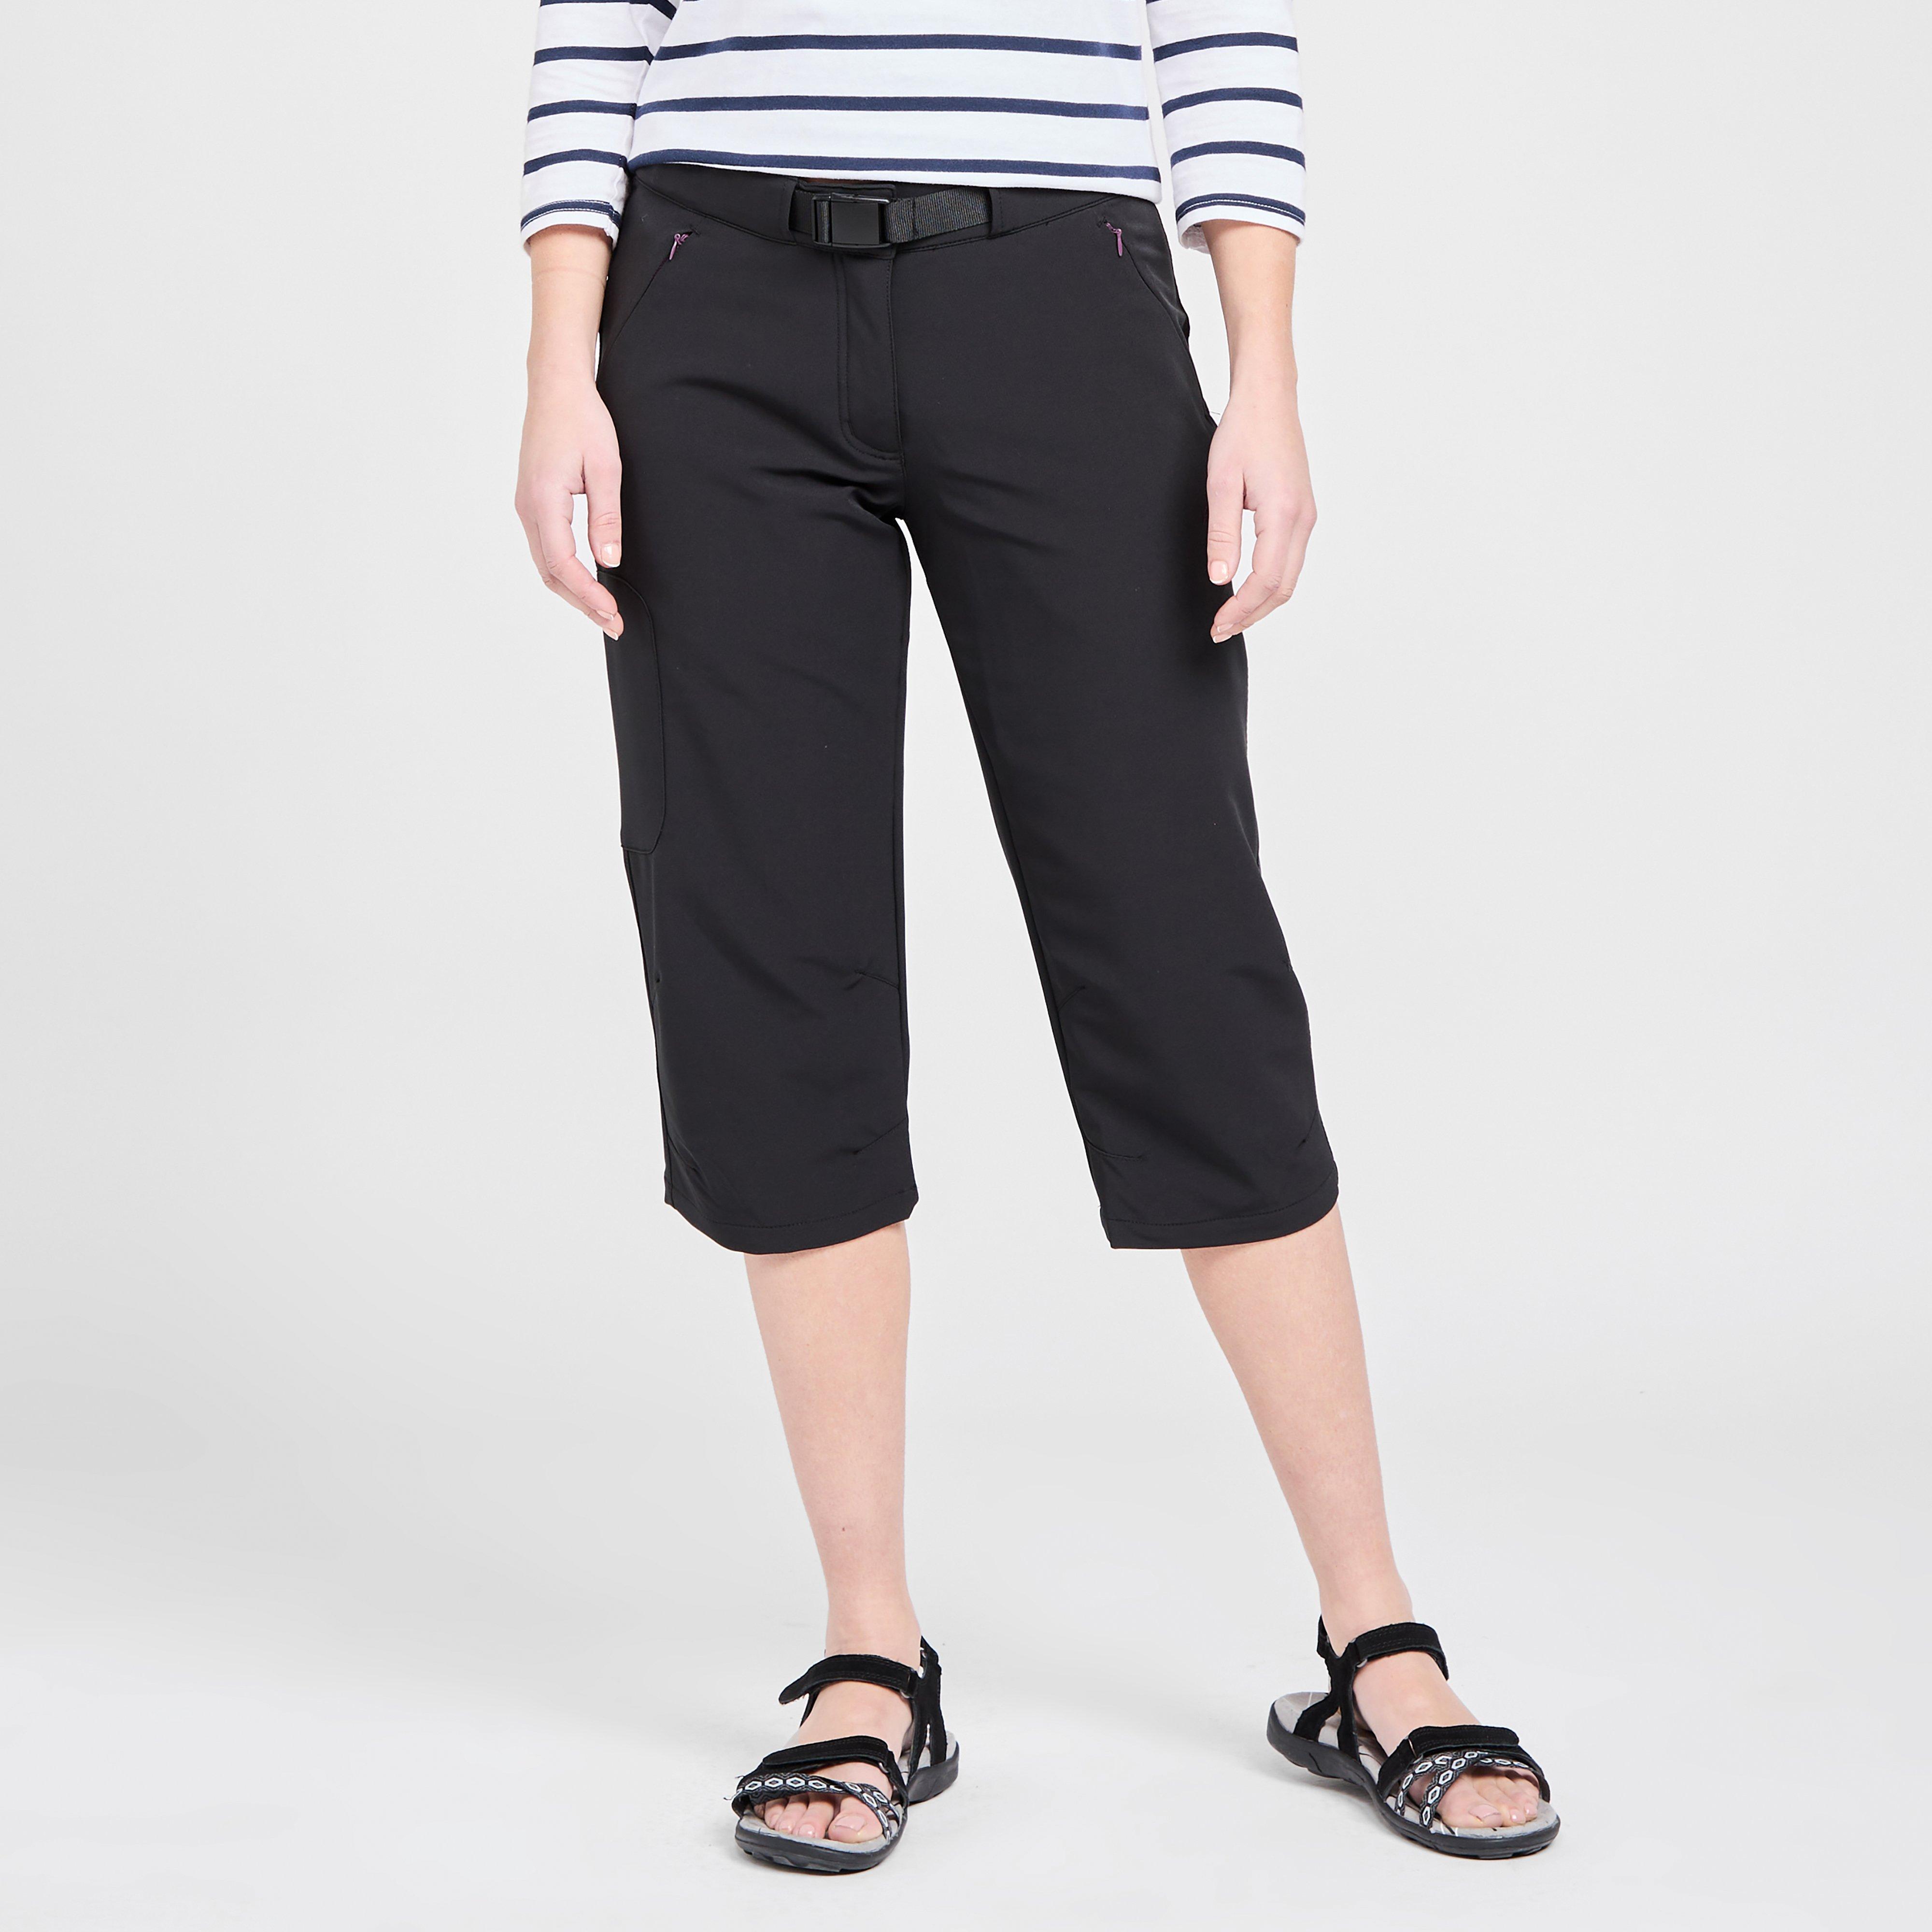 Long Outdoor New Peter Storm Women's Ramble Ii Trousers